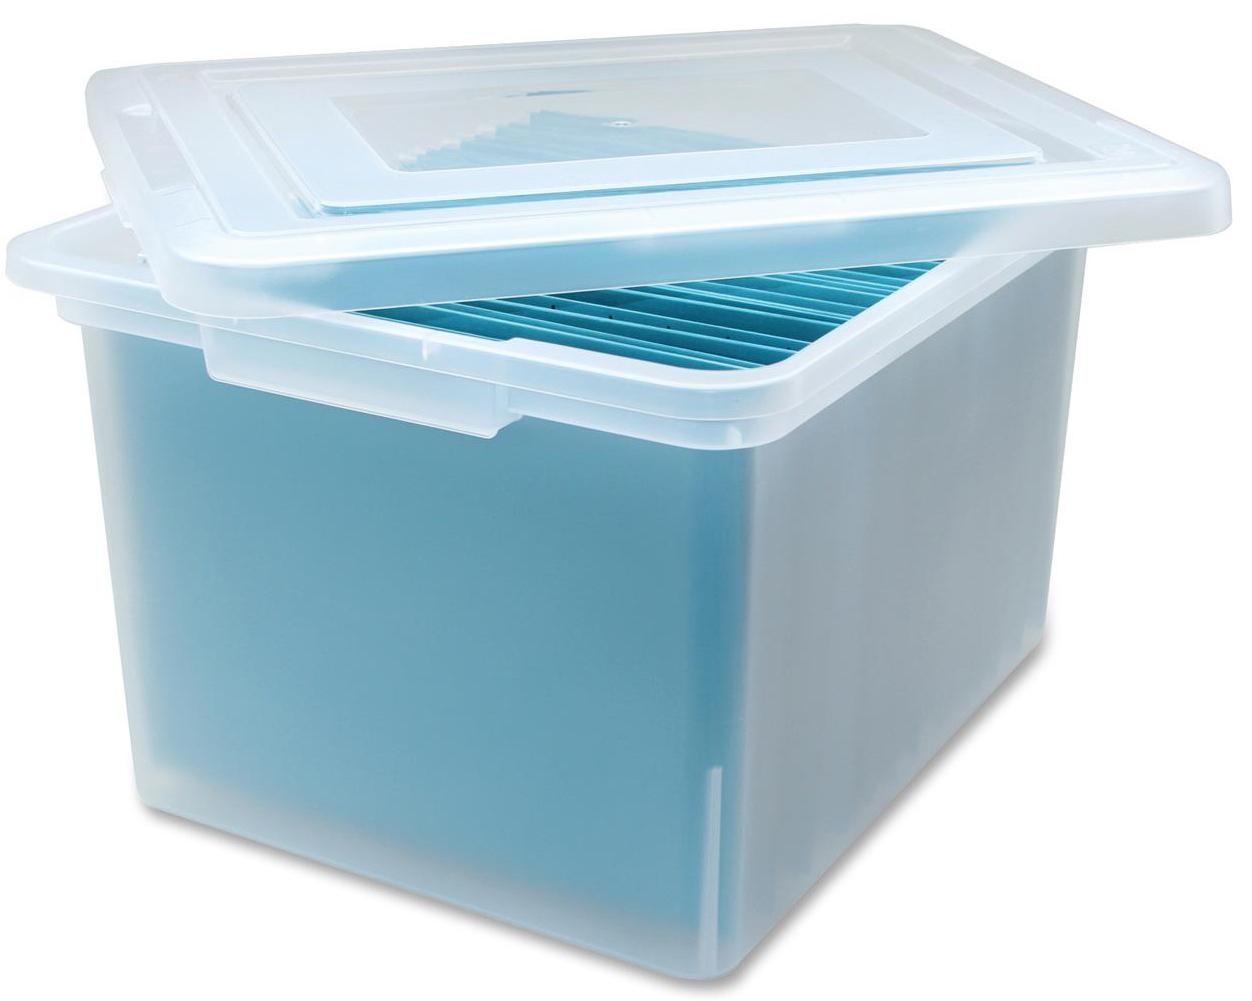 http---www.urbangirl.com-Products-Lorell-LetterLegal-Plastic-File-Box__LLR68925.aspx